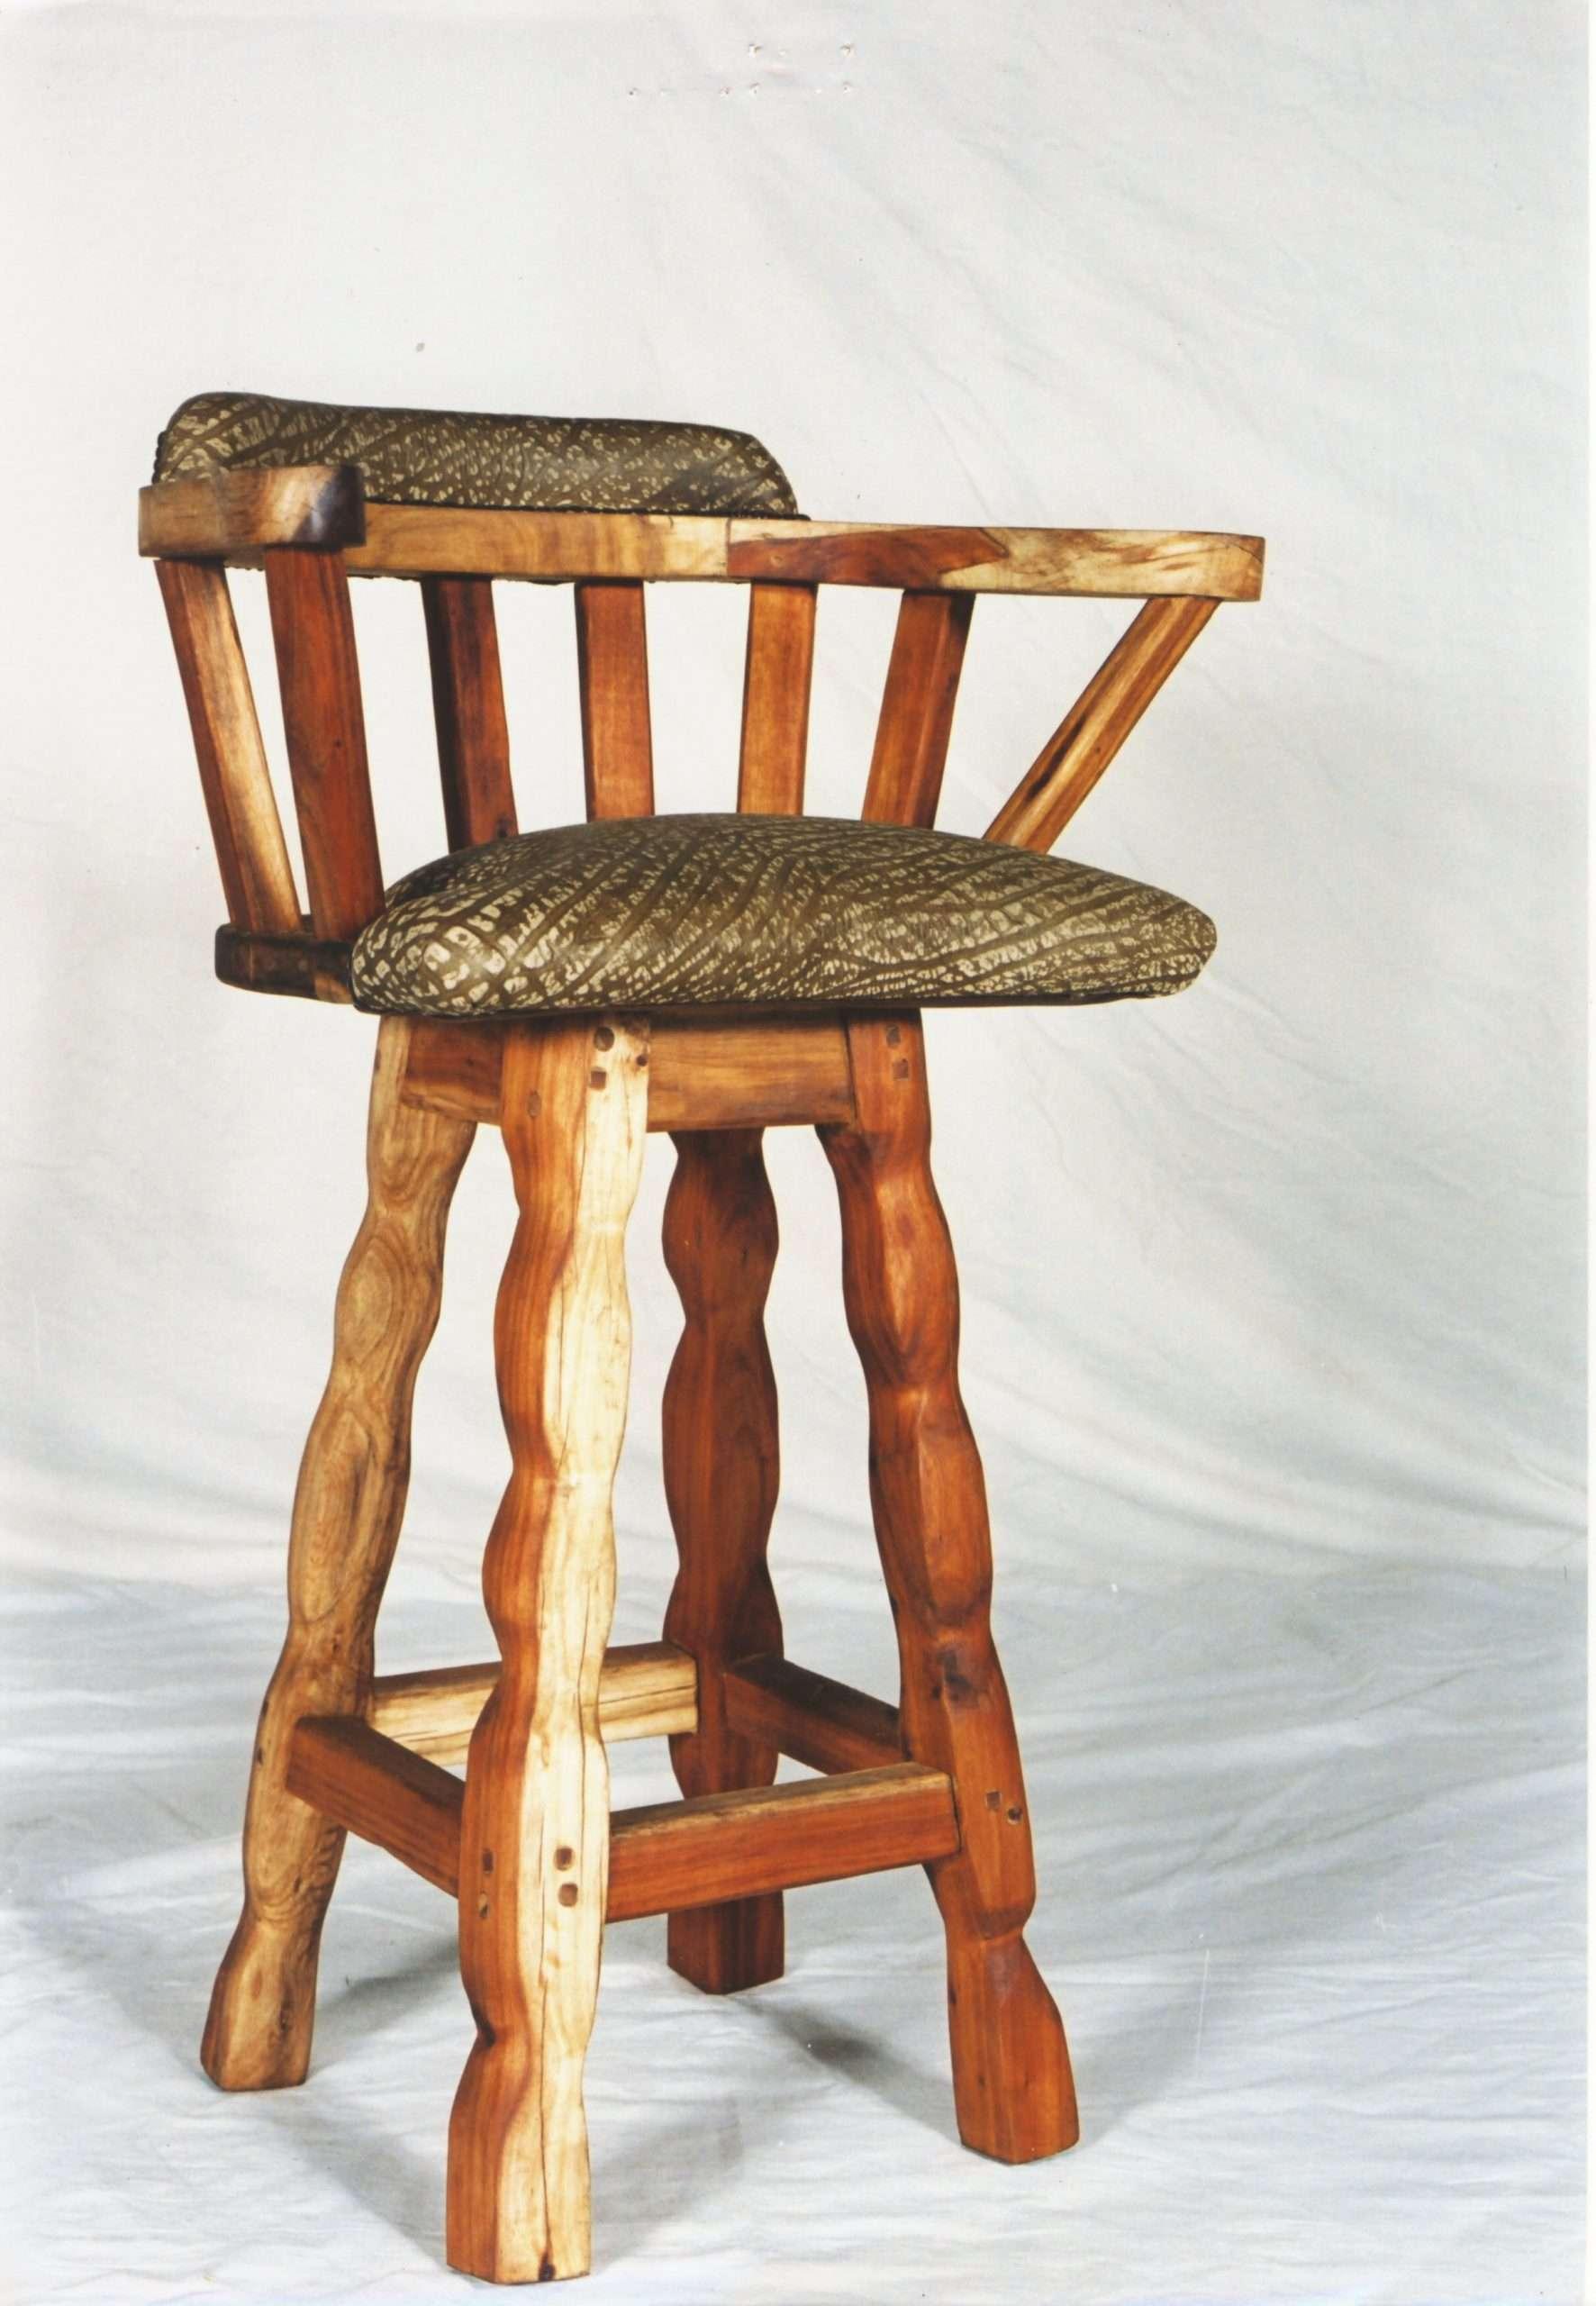 Bar Chair By Furniture ART Company